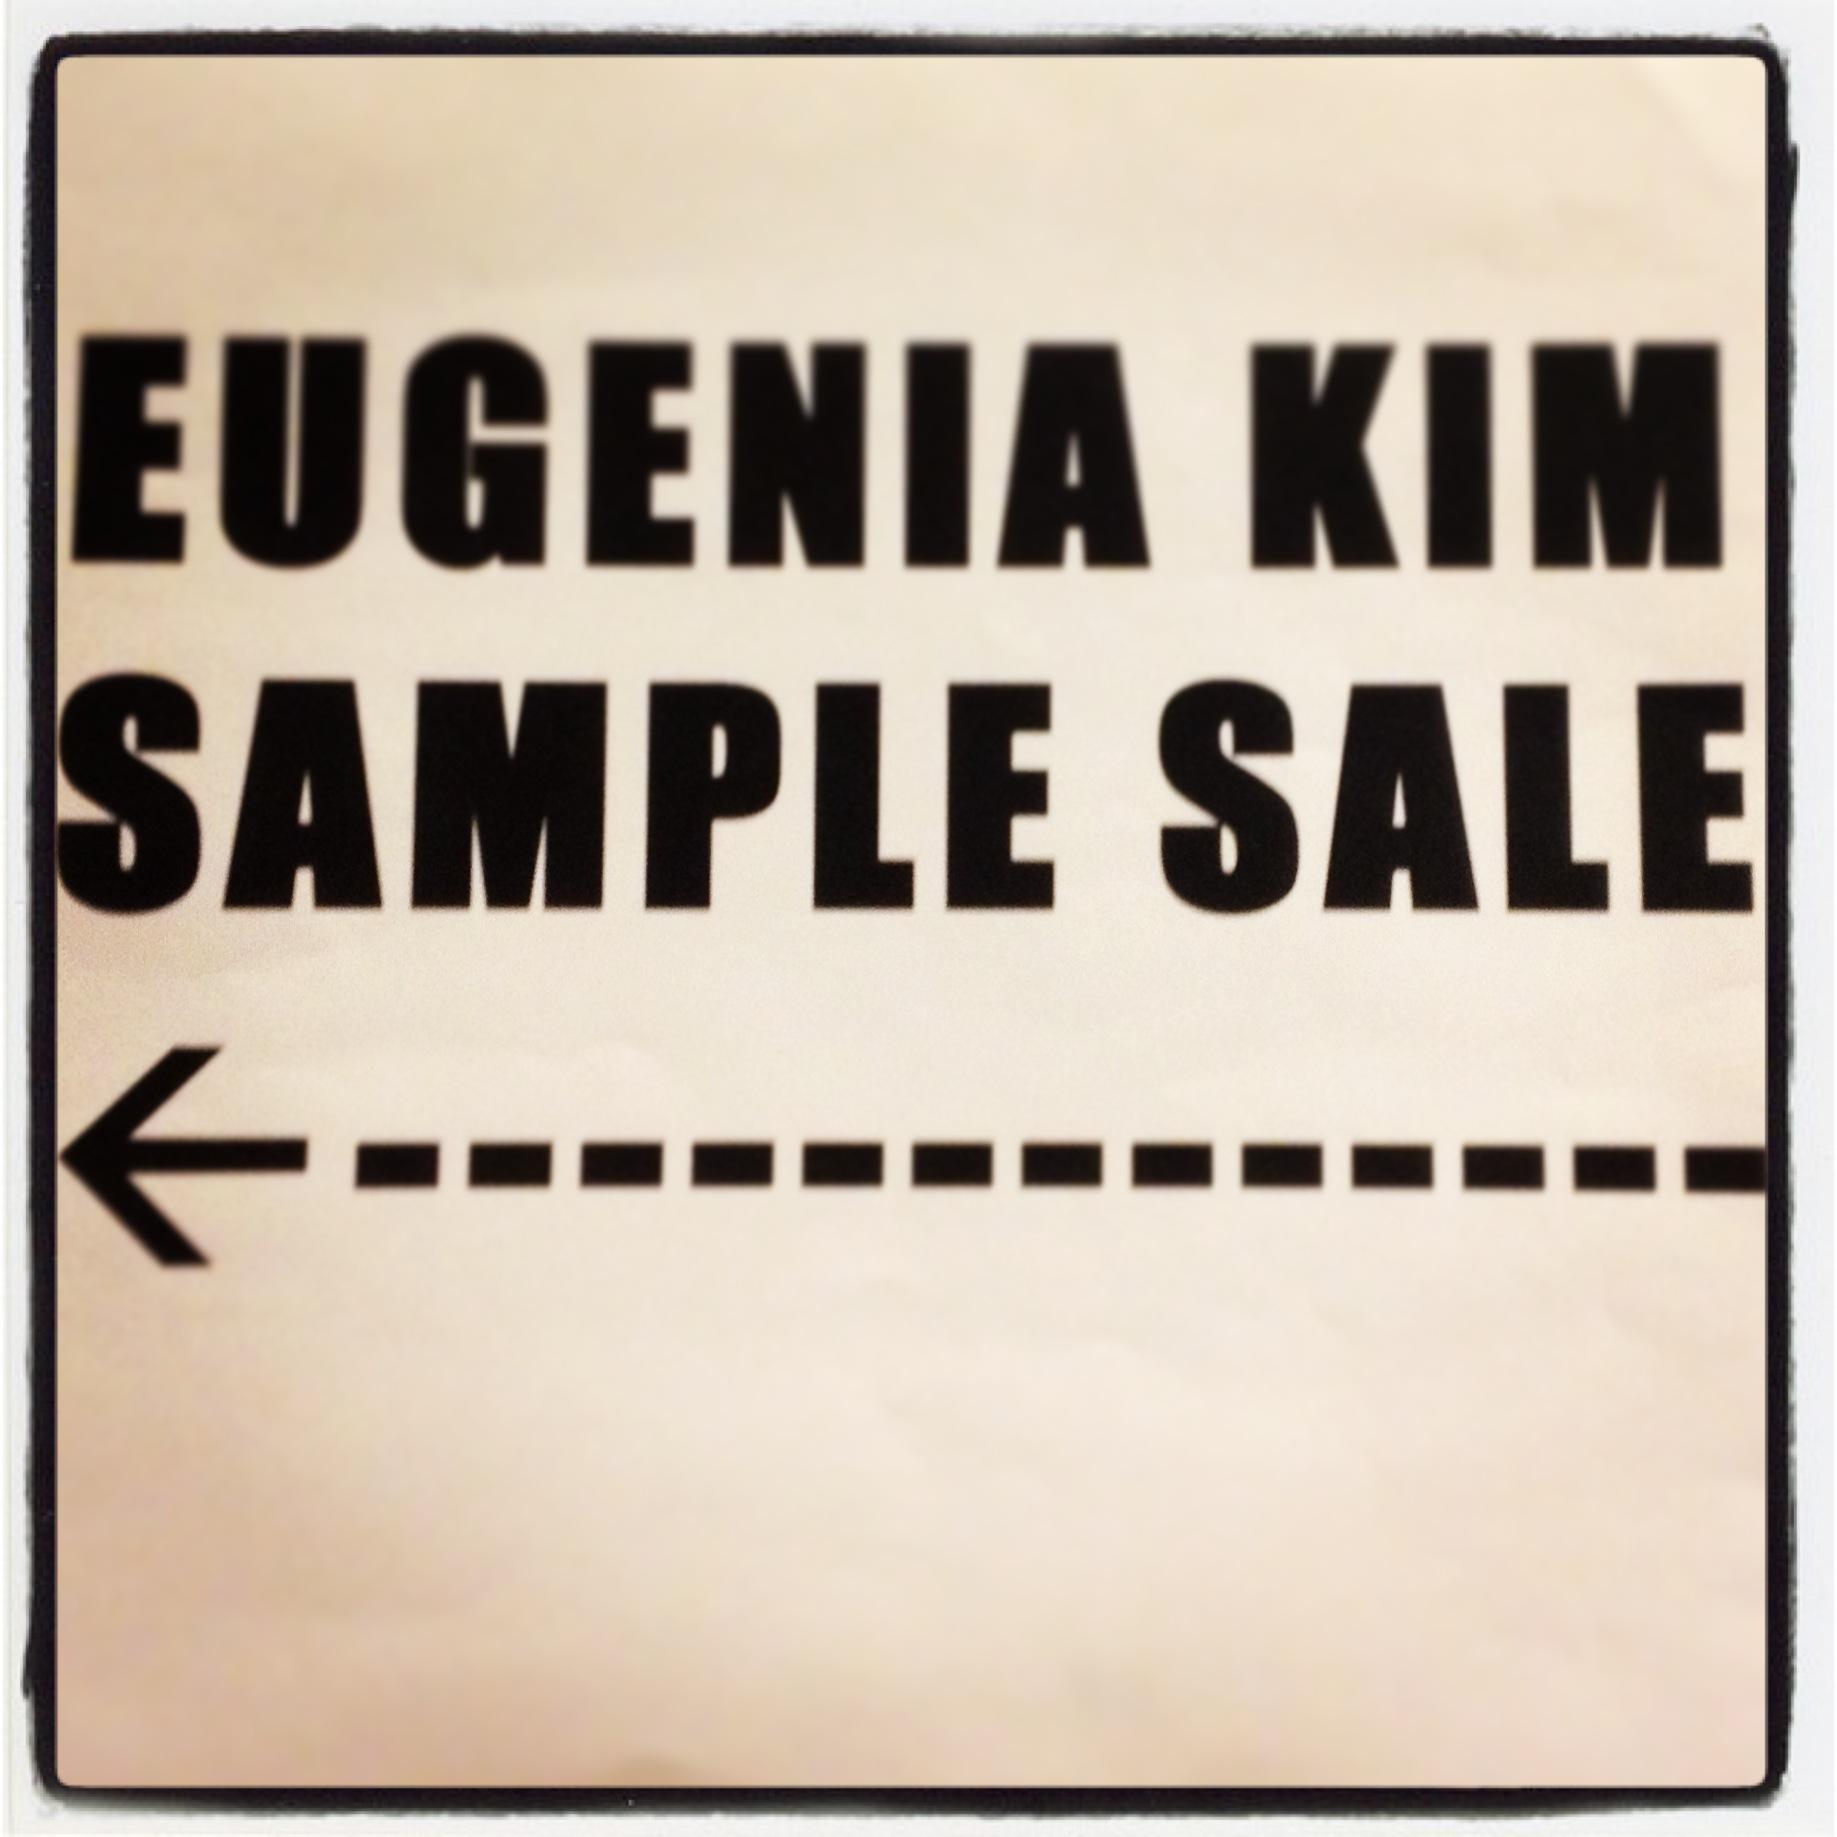 Sample Sales | fashionmomix